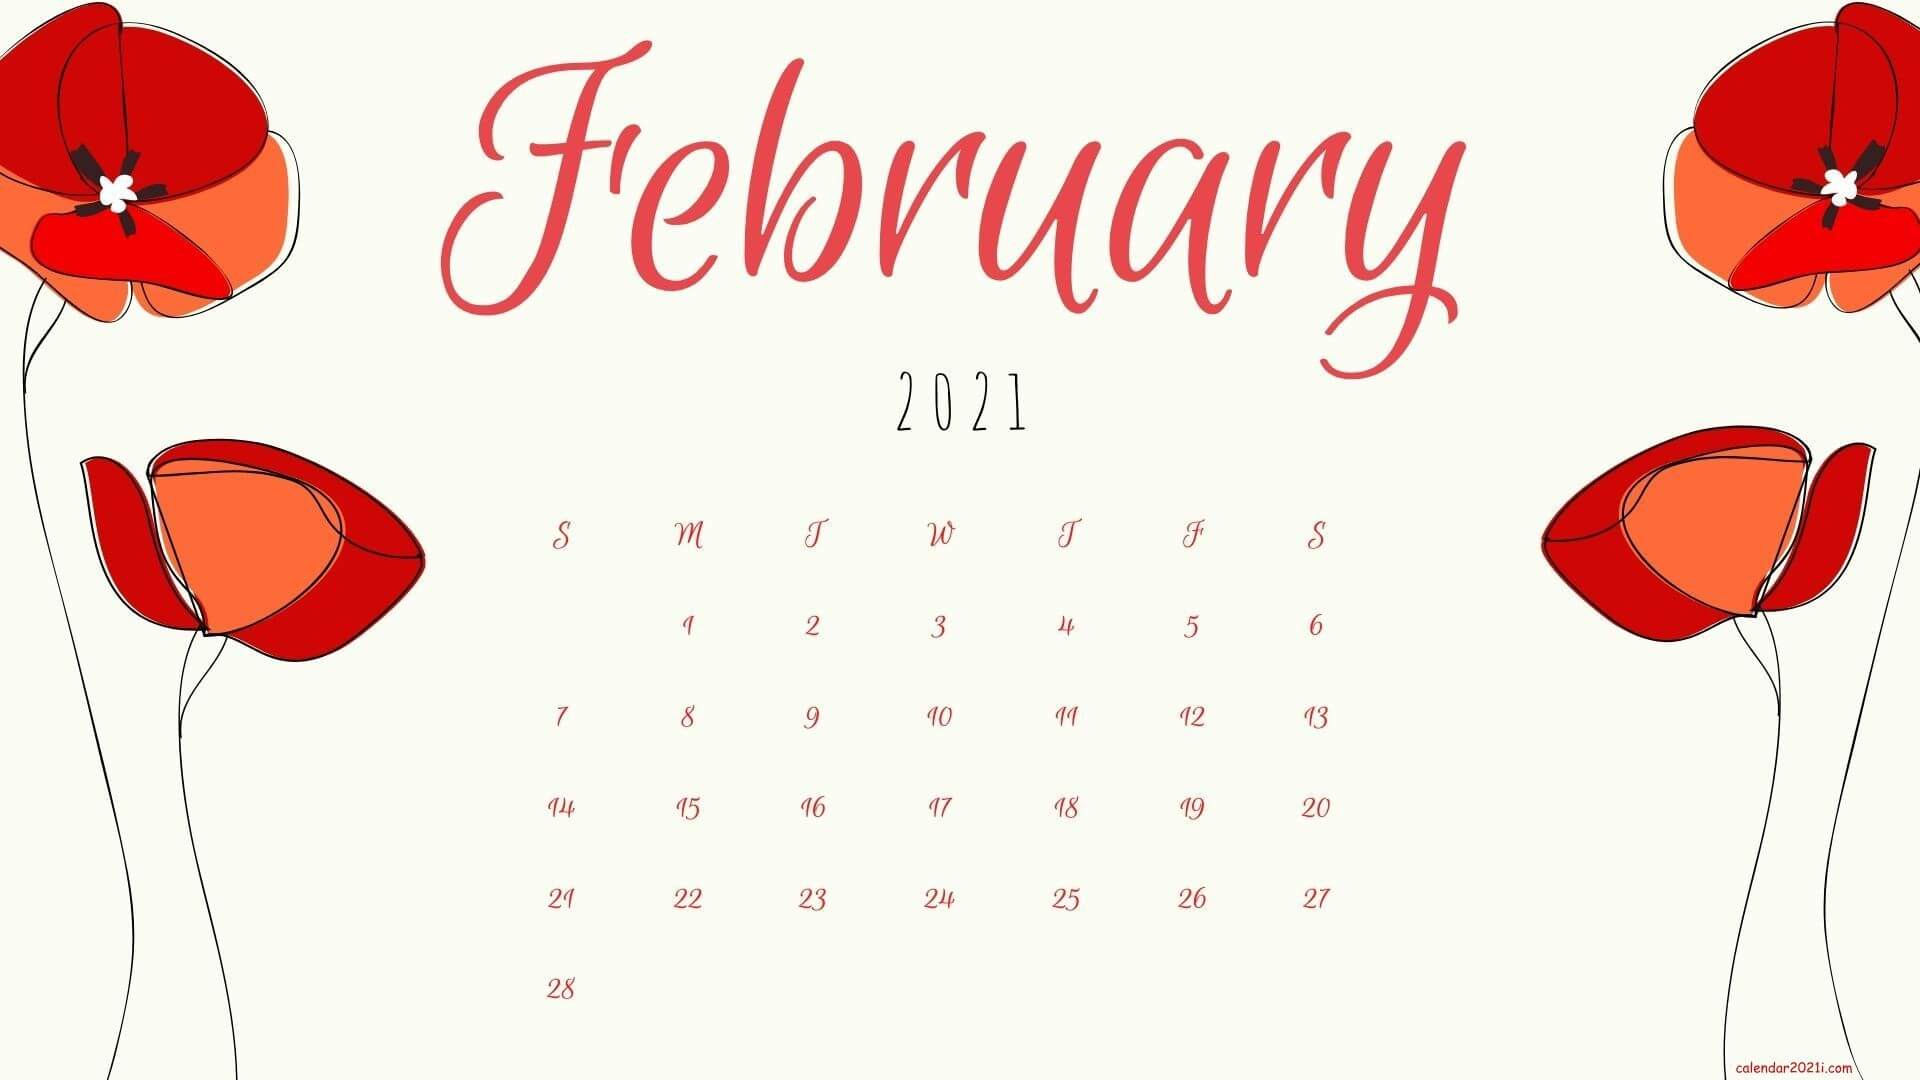 Floral February 2021 calendar Wallpaper